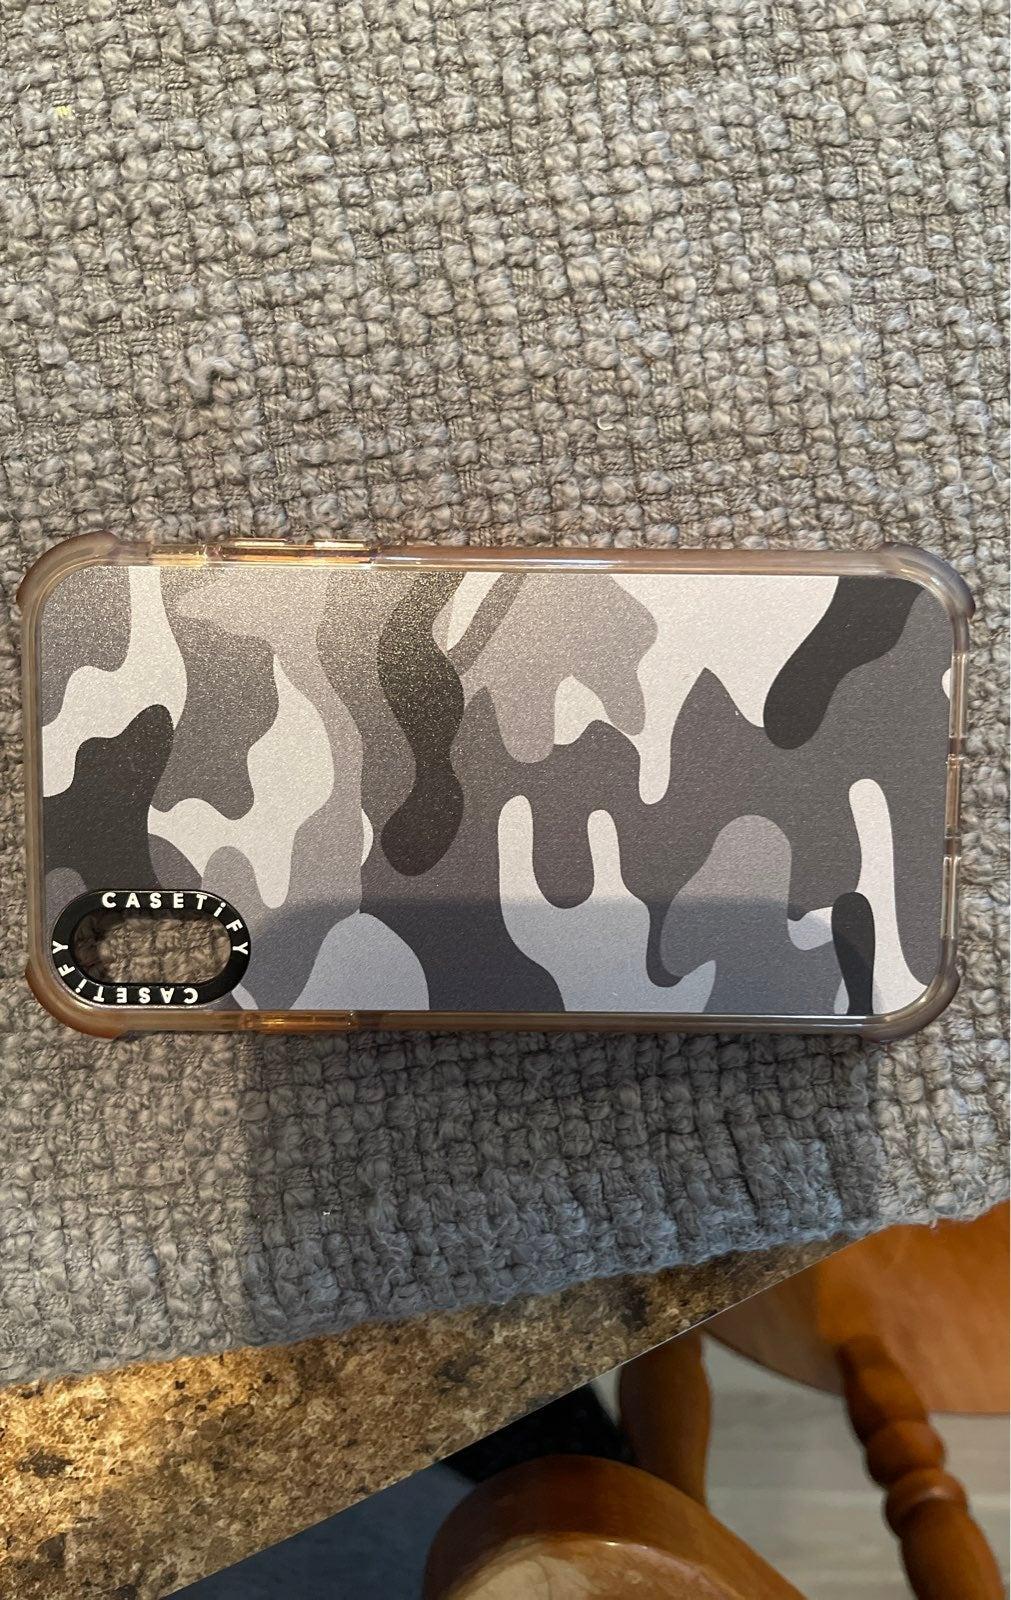 Iphone xr casetify case camo grey